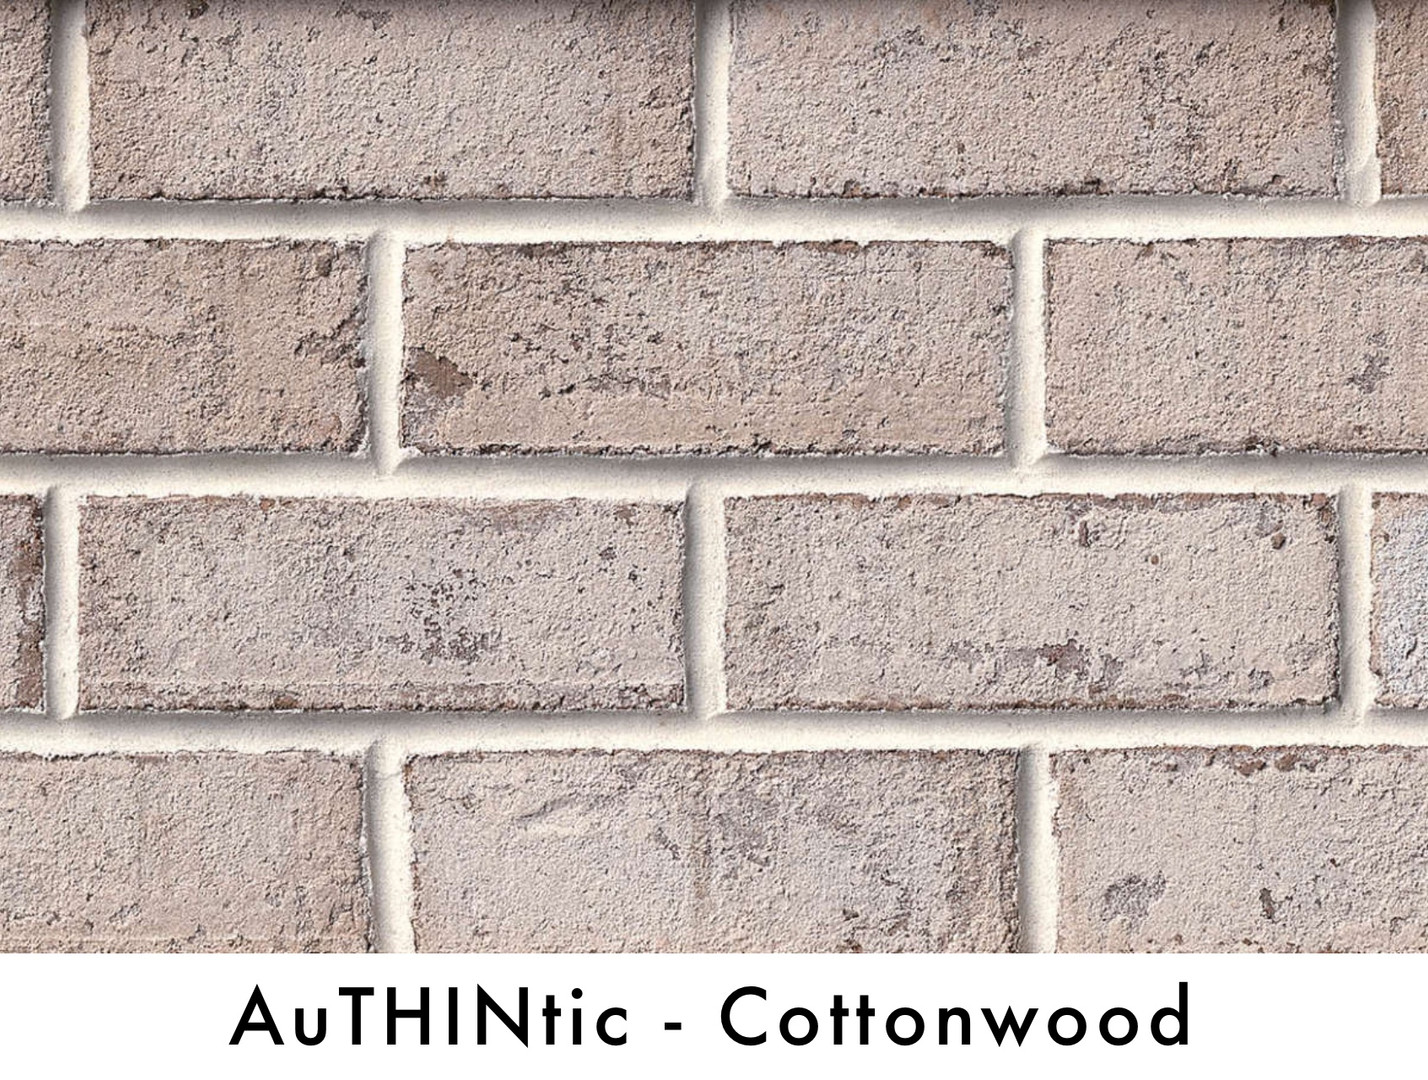 AuthinticCottonwood.jpg